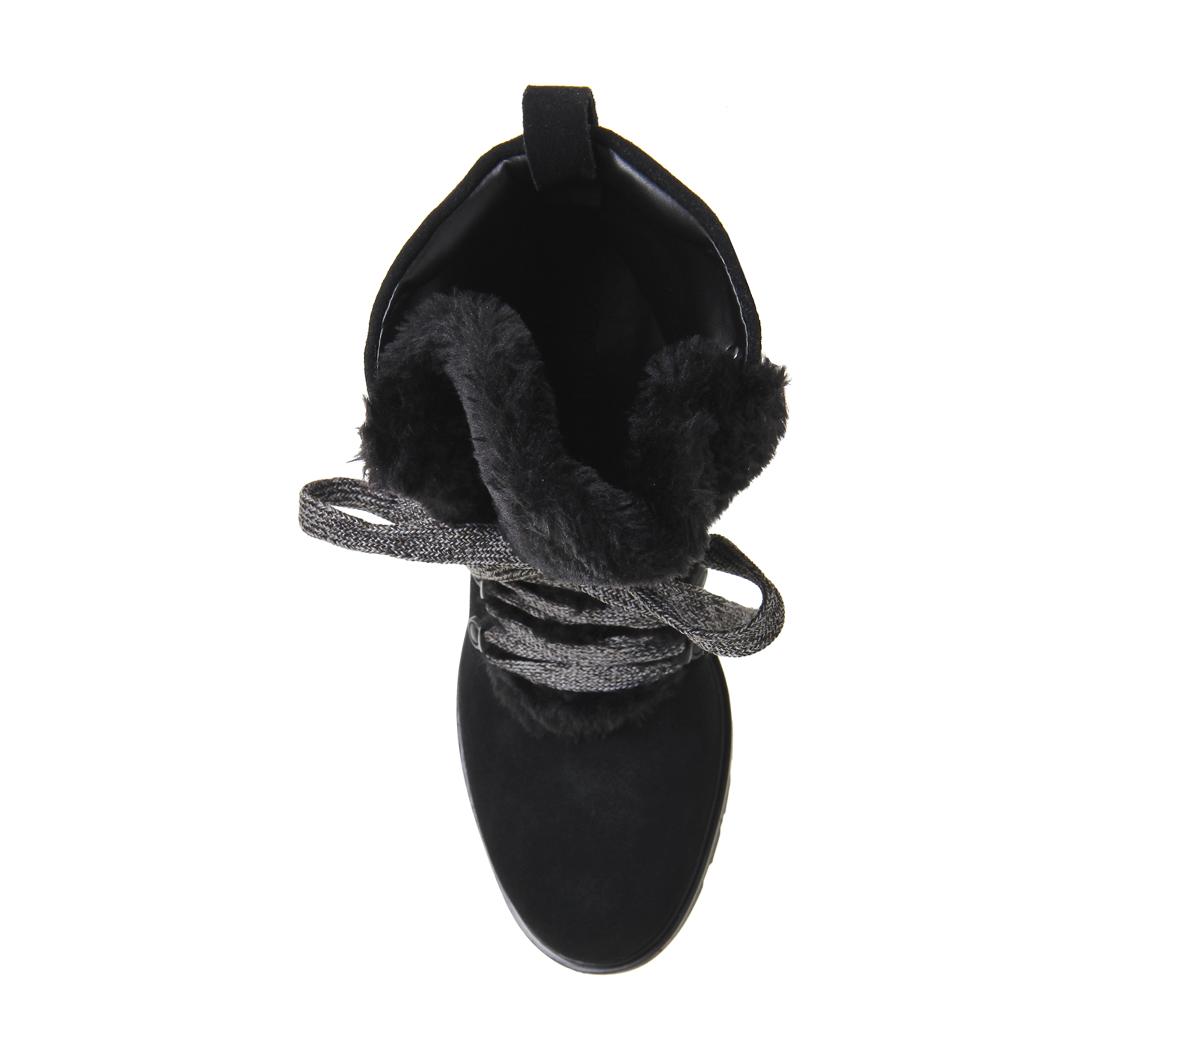 Damenschuhe Kendall - Kylie Spencer Hiker BLACK SUEDE Stiefel